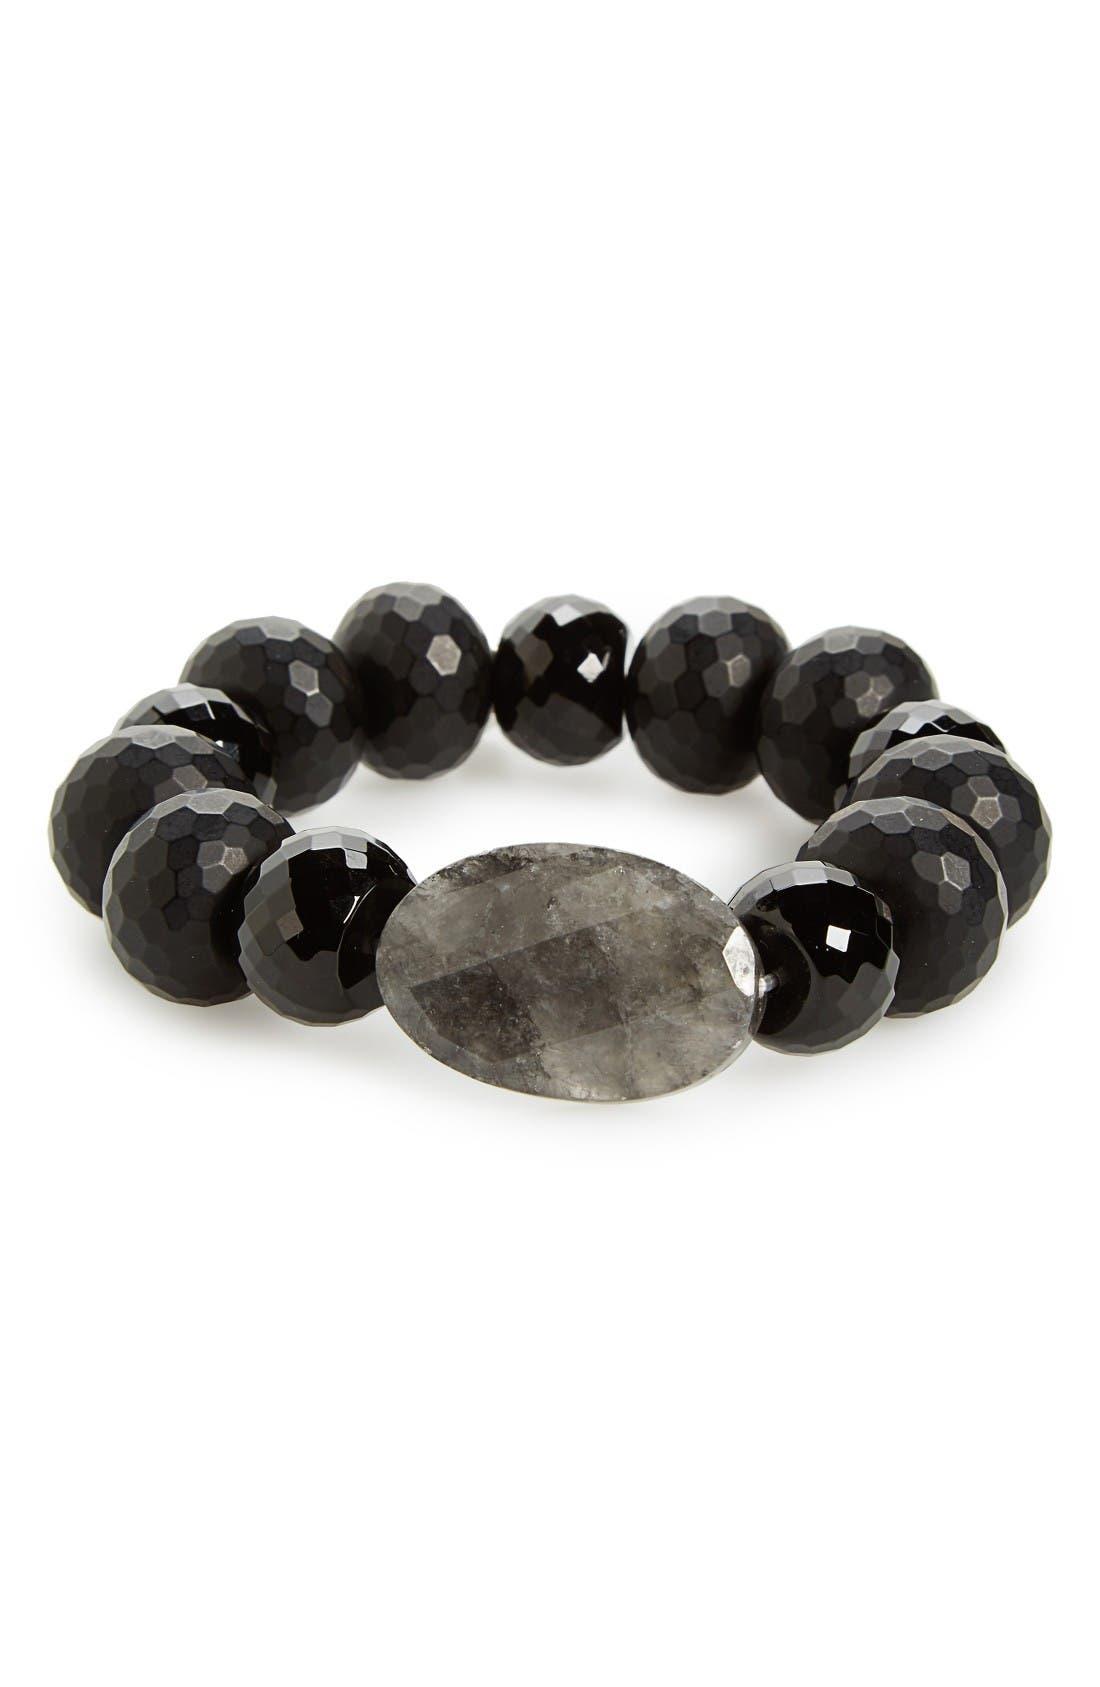 Main Image - Chan Luu Semiprecious Stone Stretch Bracelet